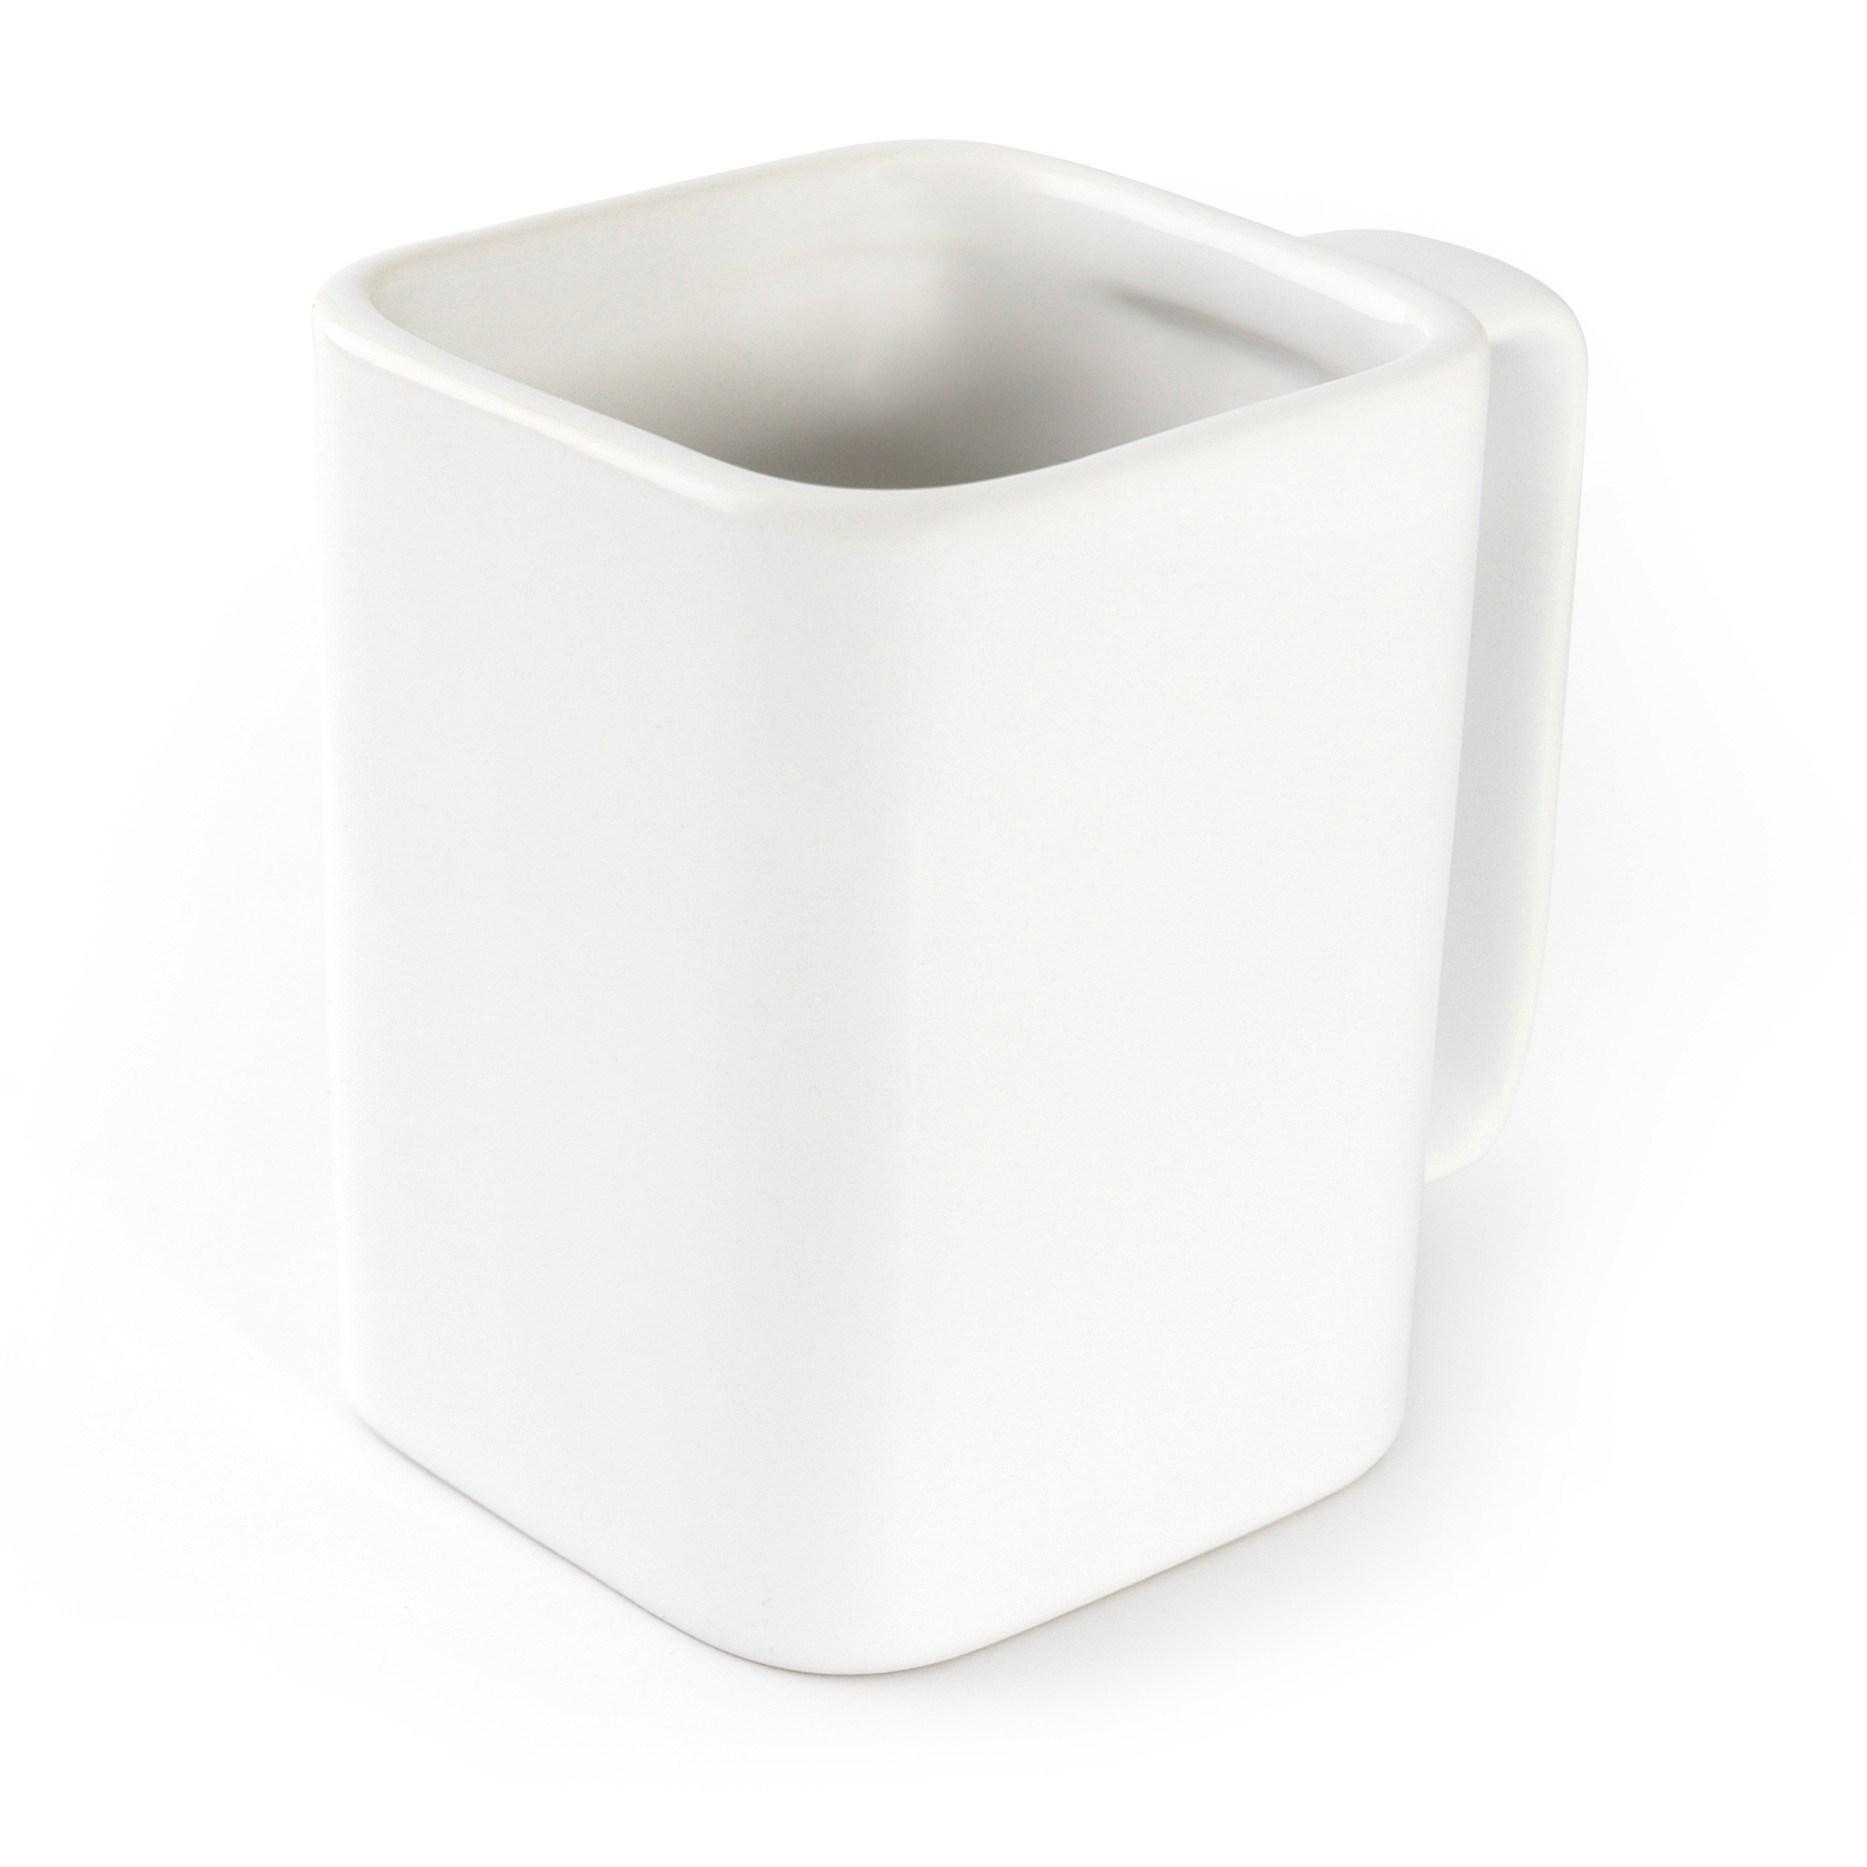 Zibo Tysan Light Industrial Products Co Ltd: Real Square Ceramic Mug